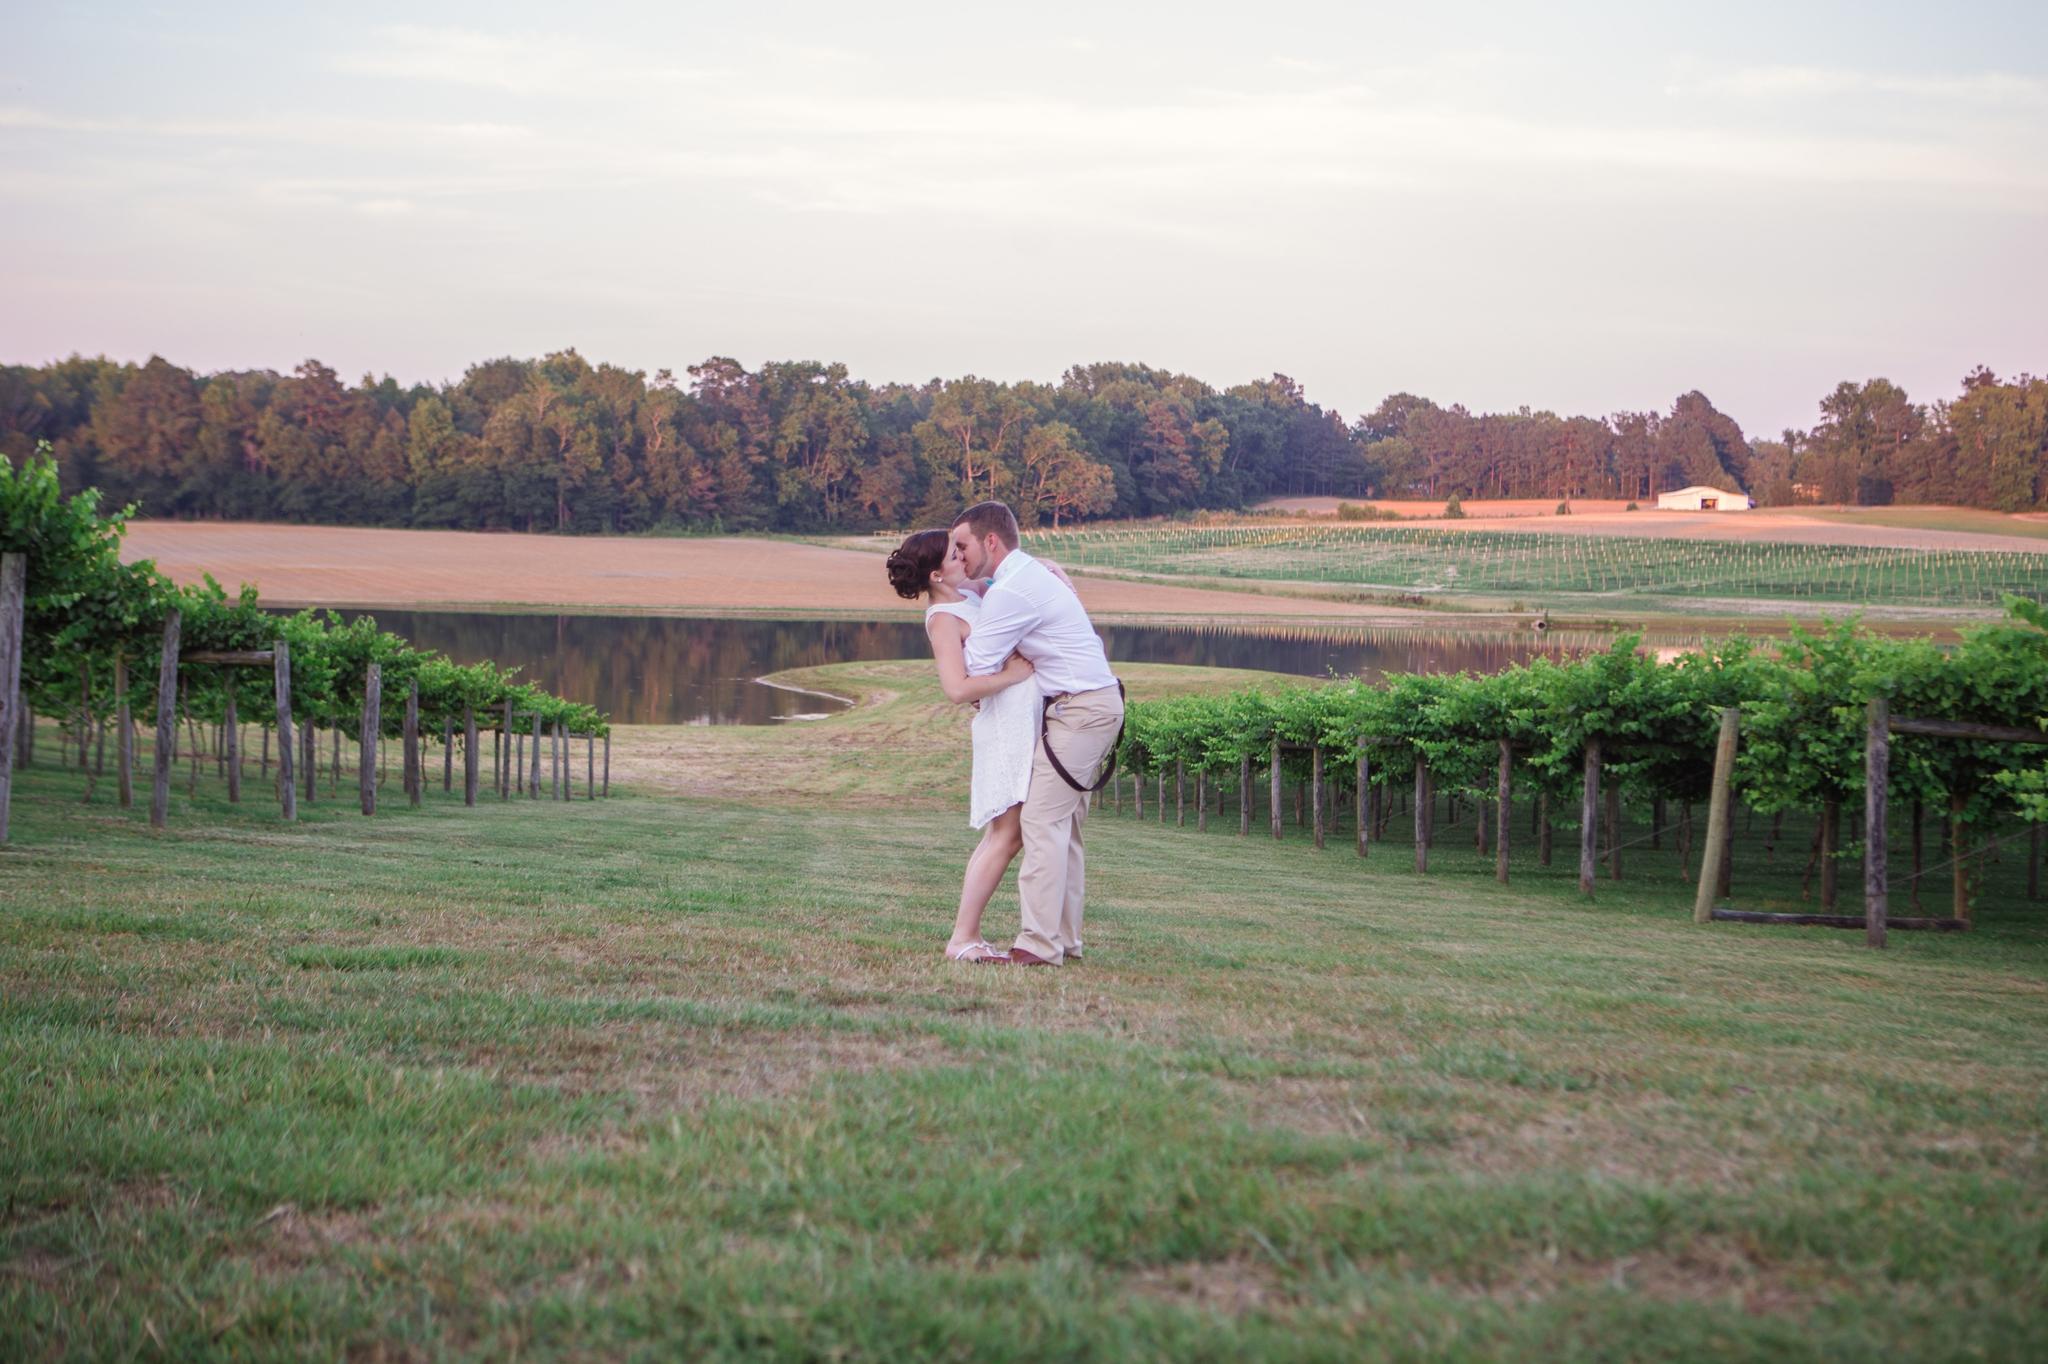 Gregory Vineyard Wedding Photographer in Fayetteville, North Carolina